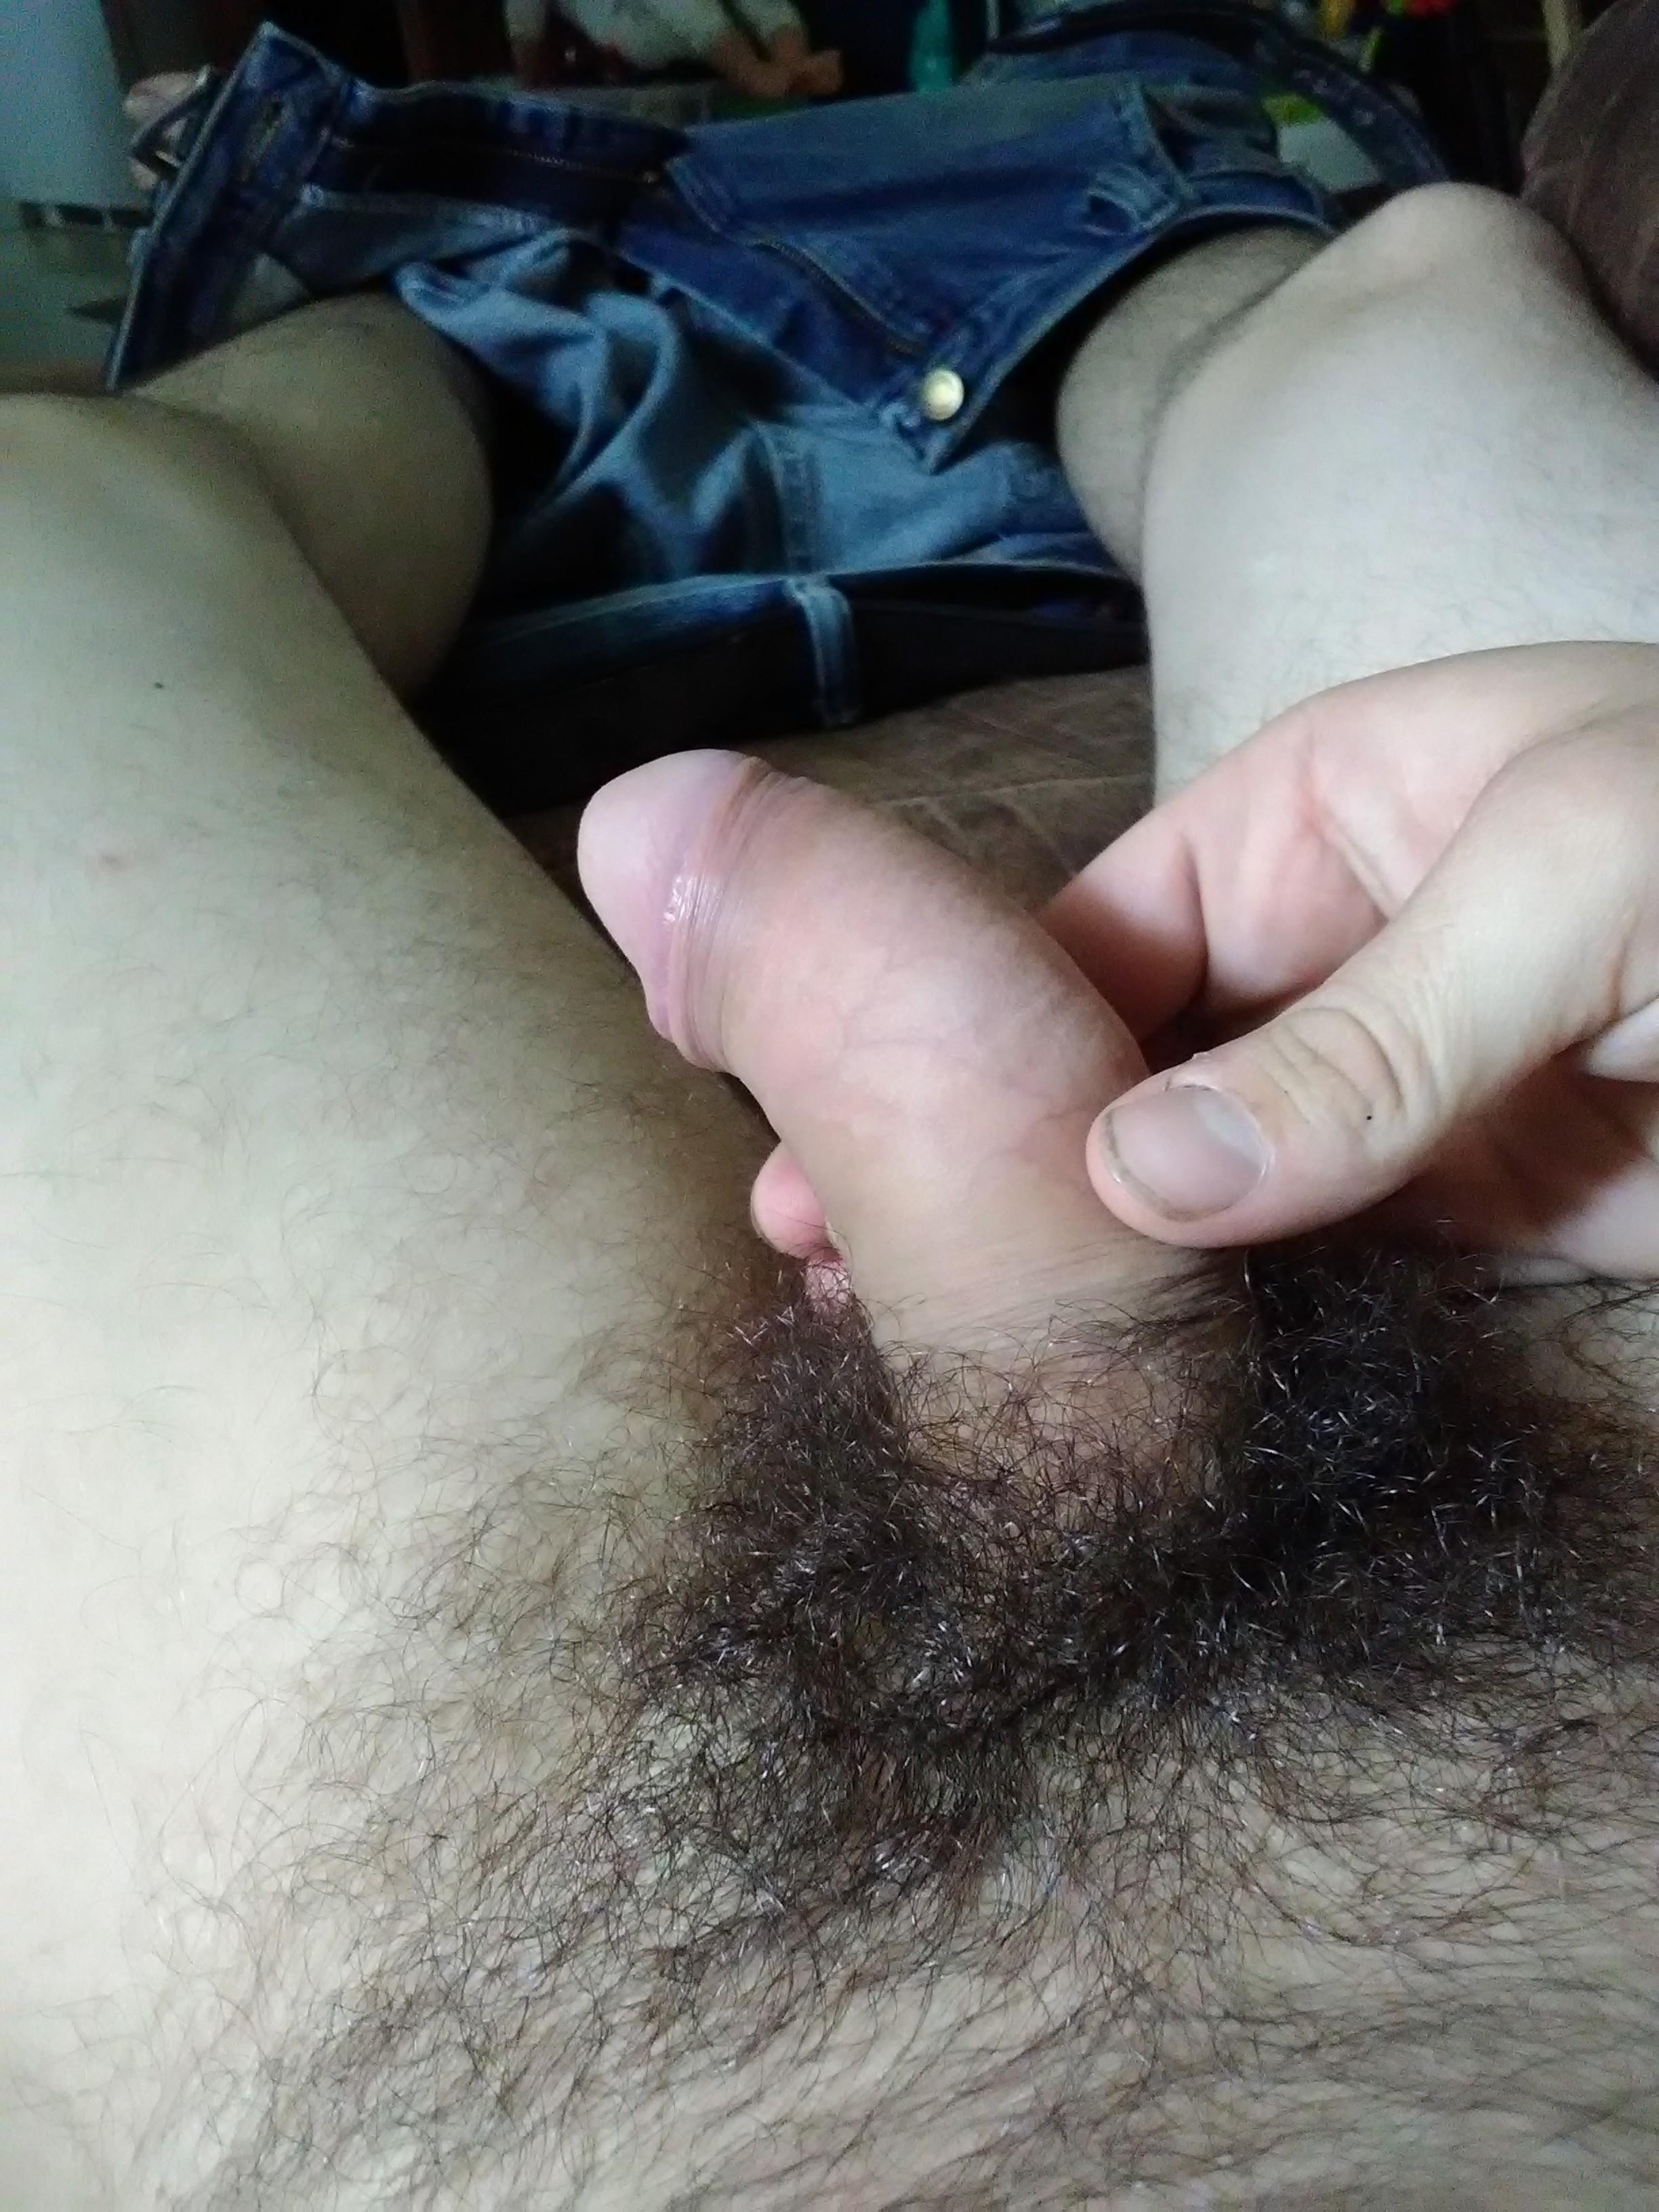 Porn sex you tobe